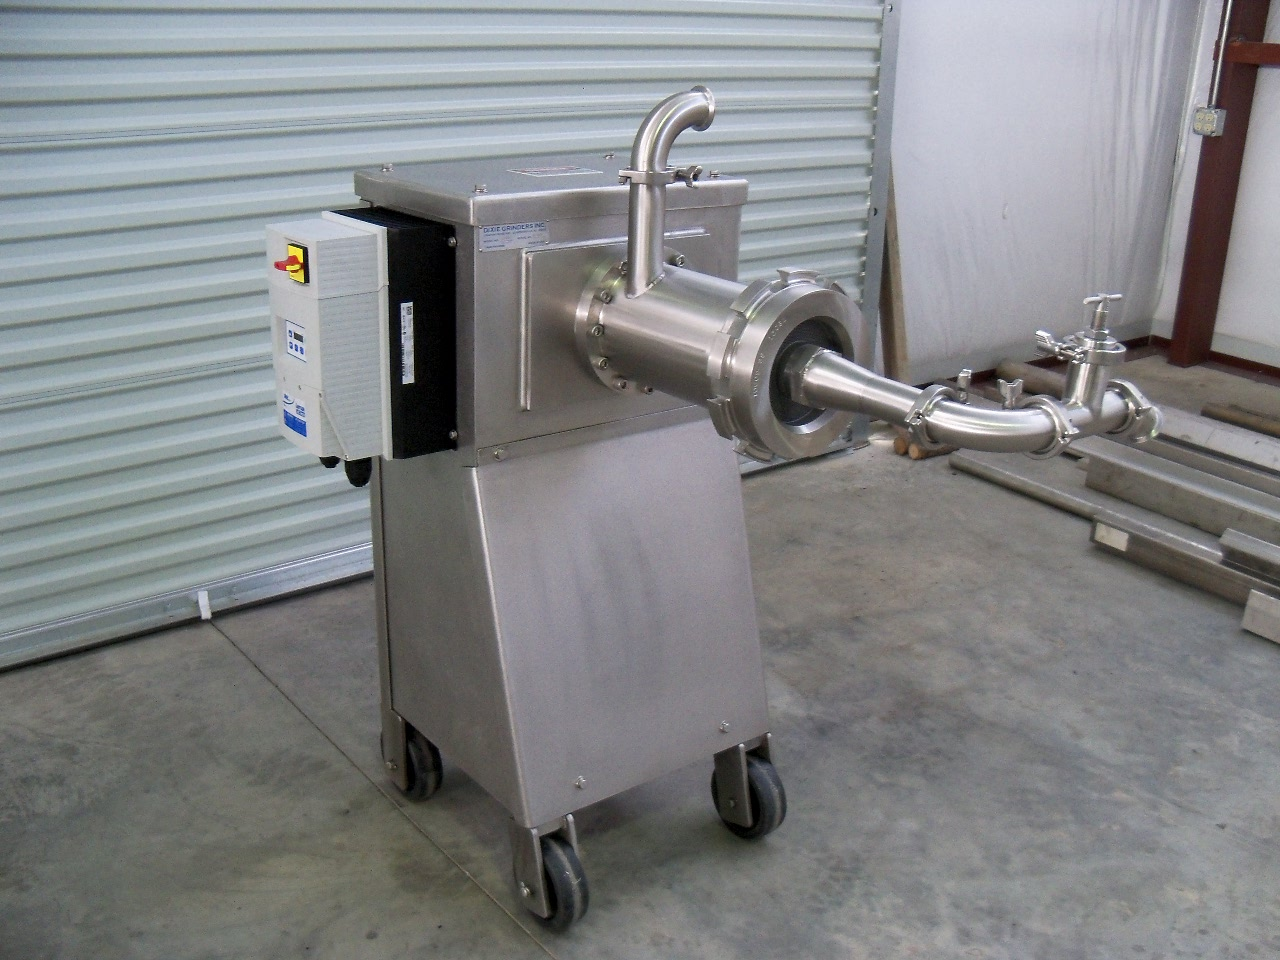 Rework grinder